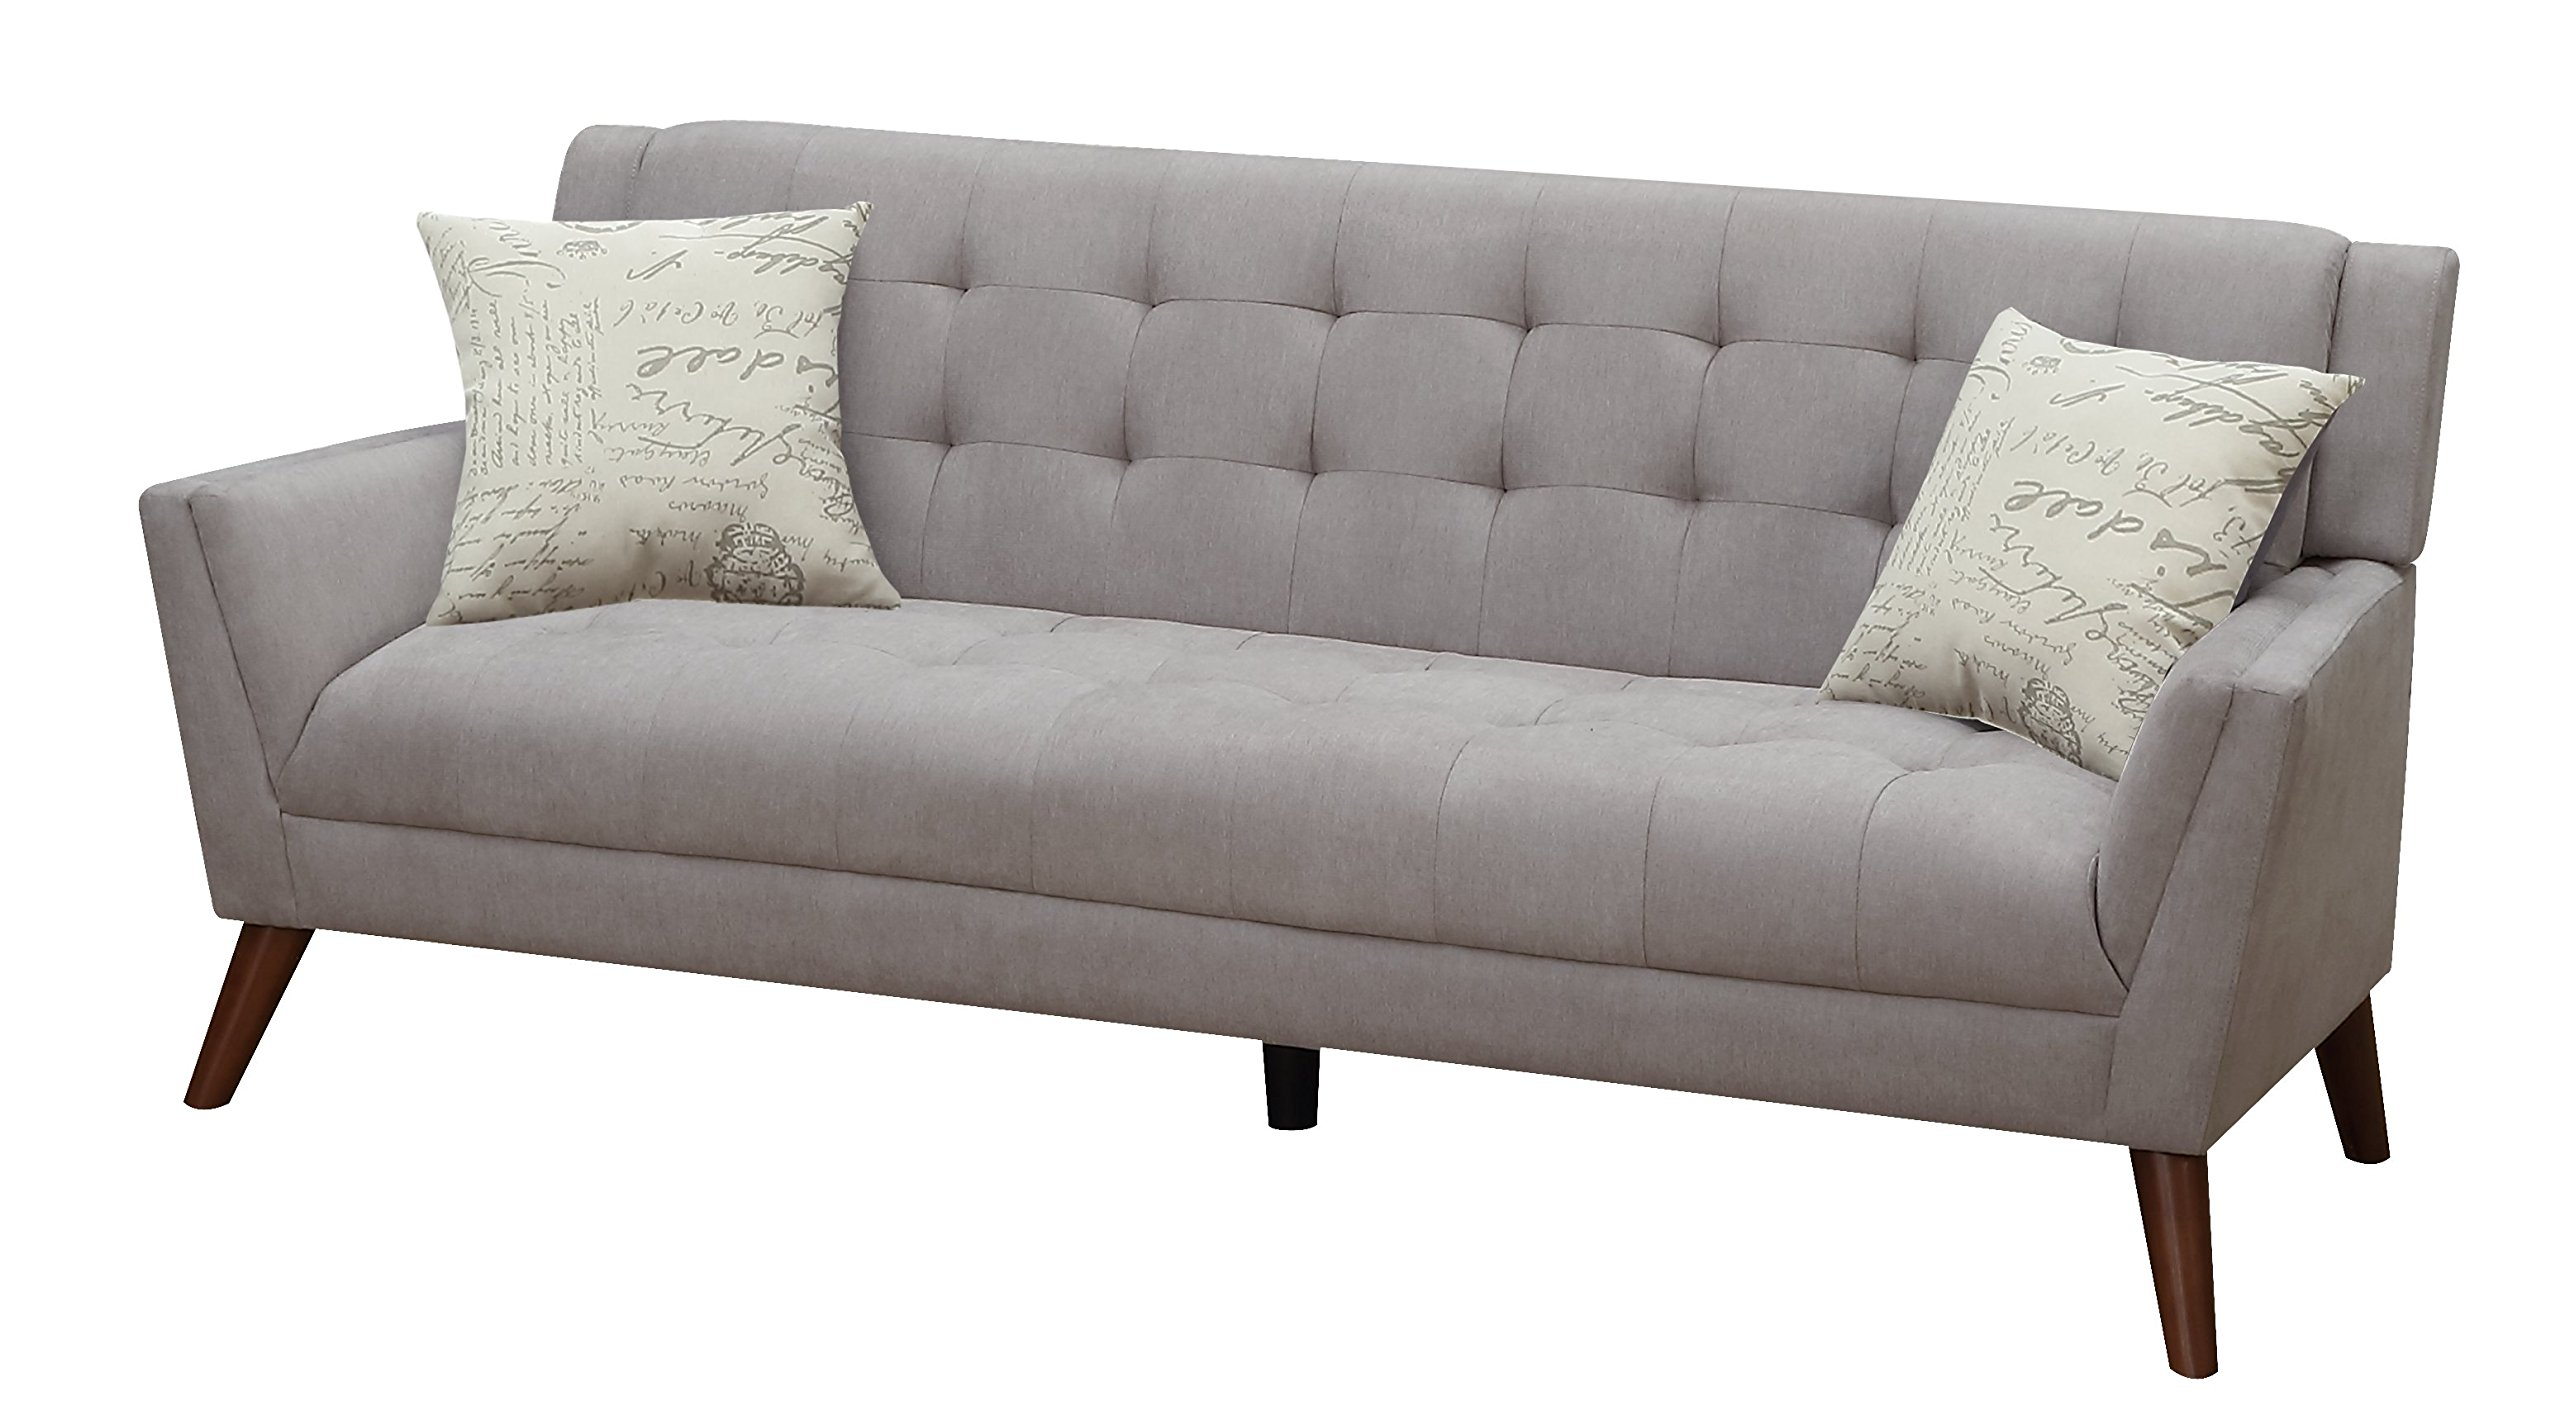 Furniture World Mid Century Sofa, Gray